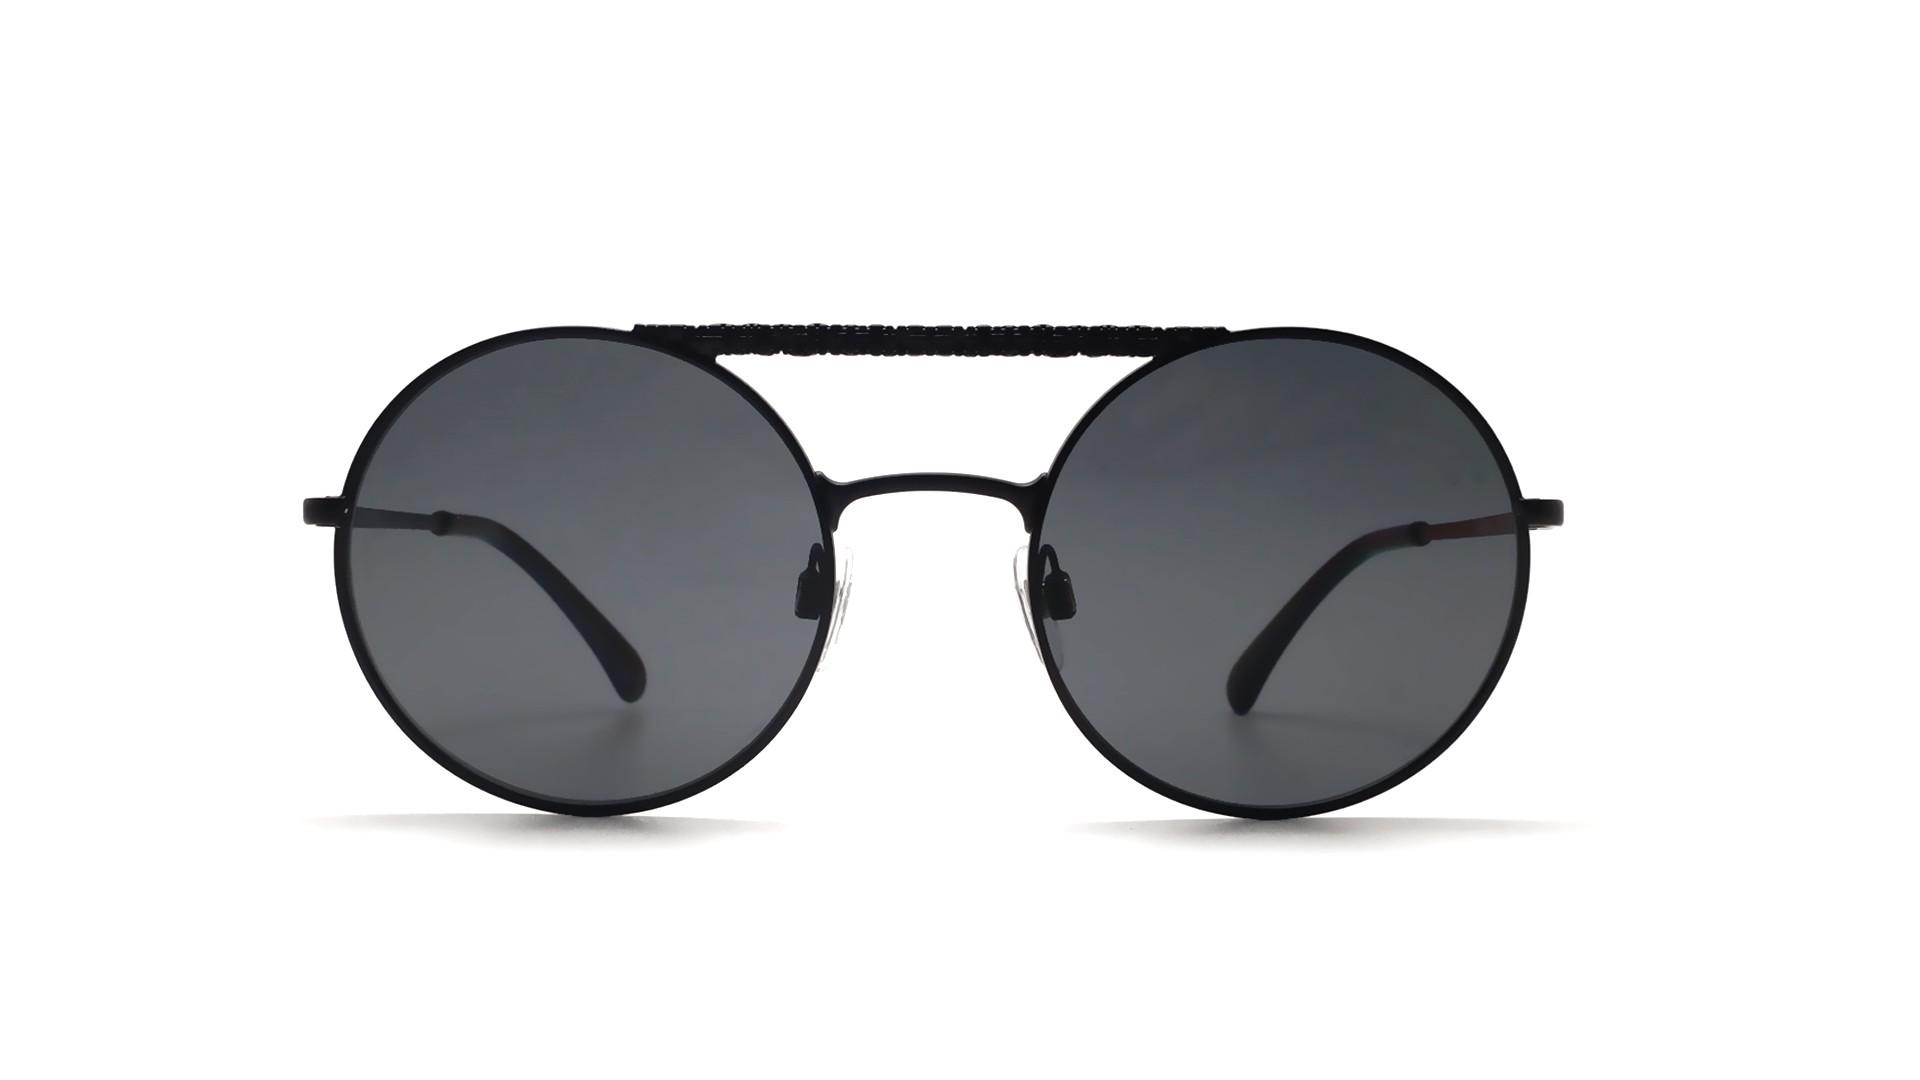 657cb6c8190ee Sunglasses Chanel CH4232 C101 T8 53-21 Black Mat Medium Polarized